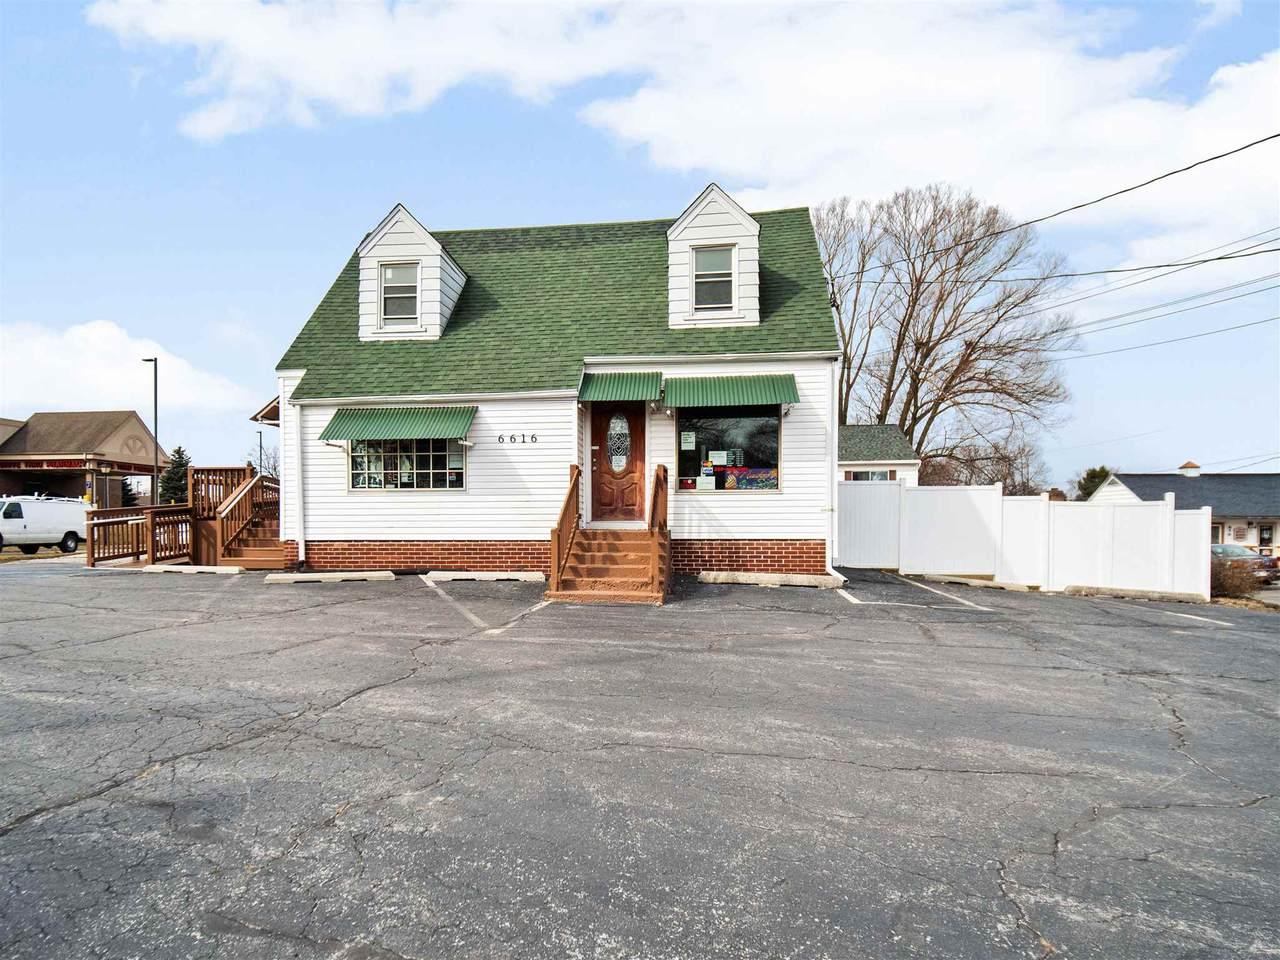 6616 Bluffton Road - Photo 1